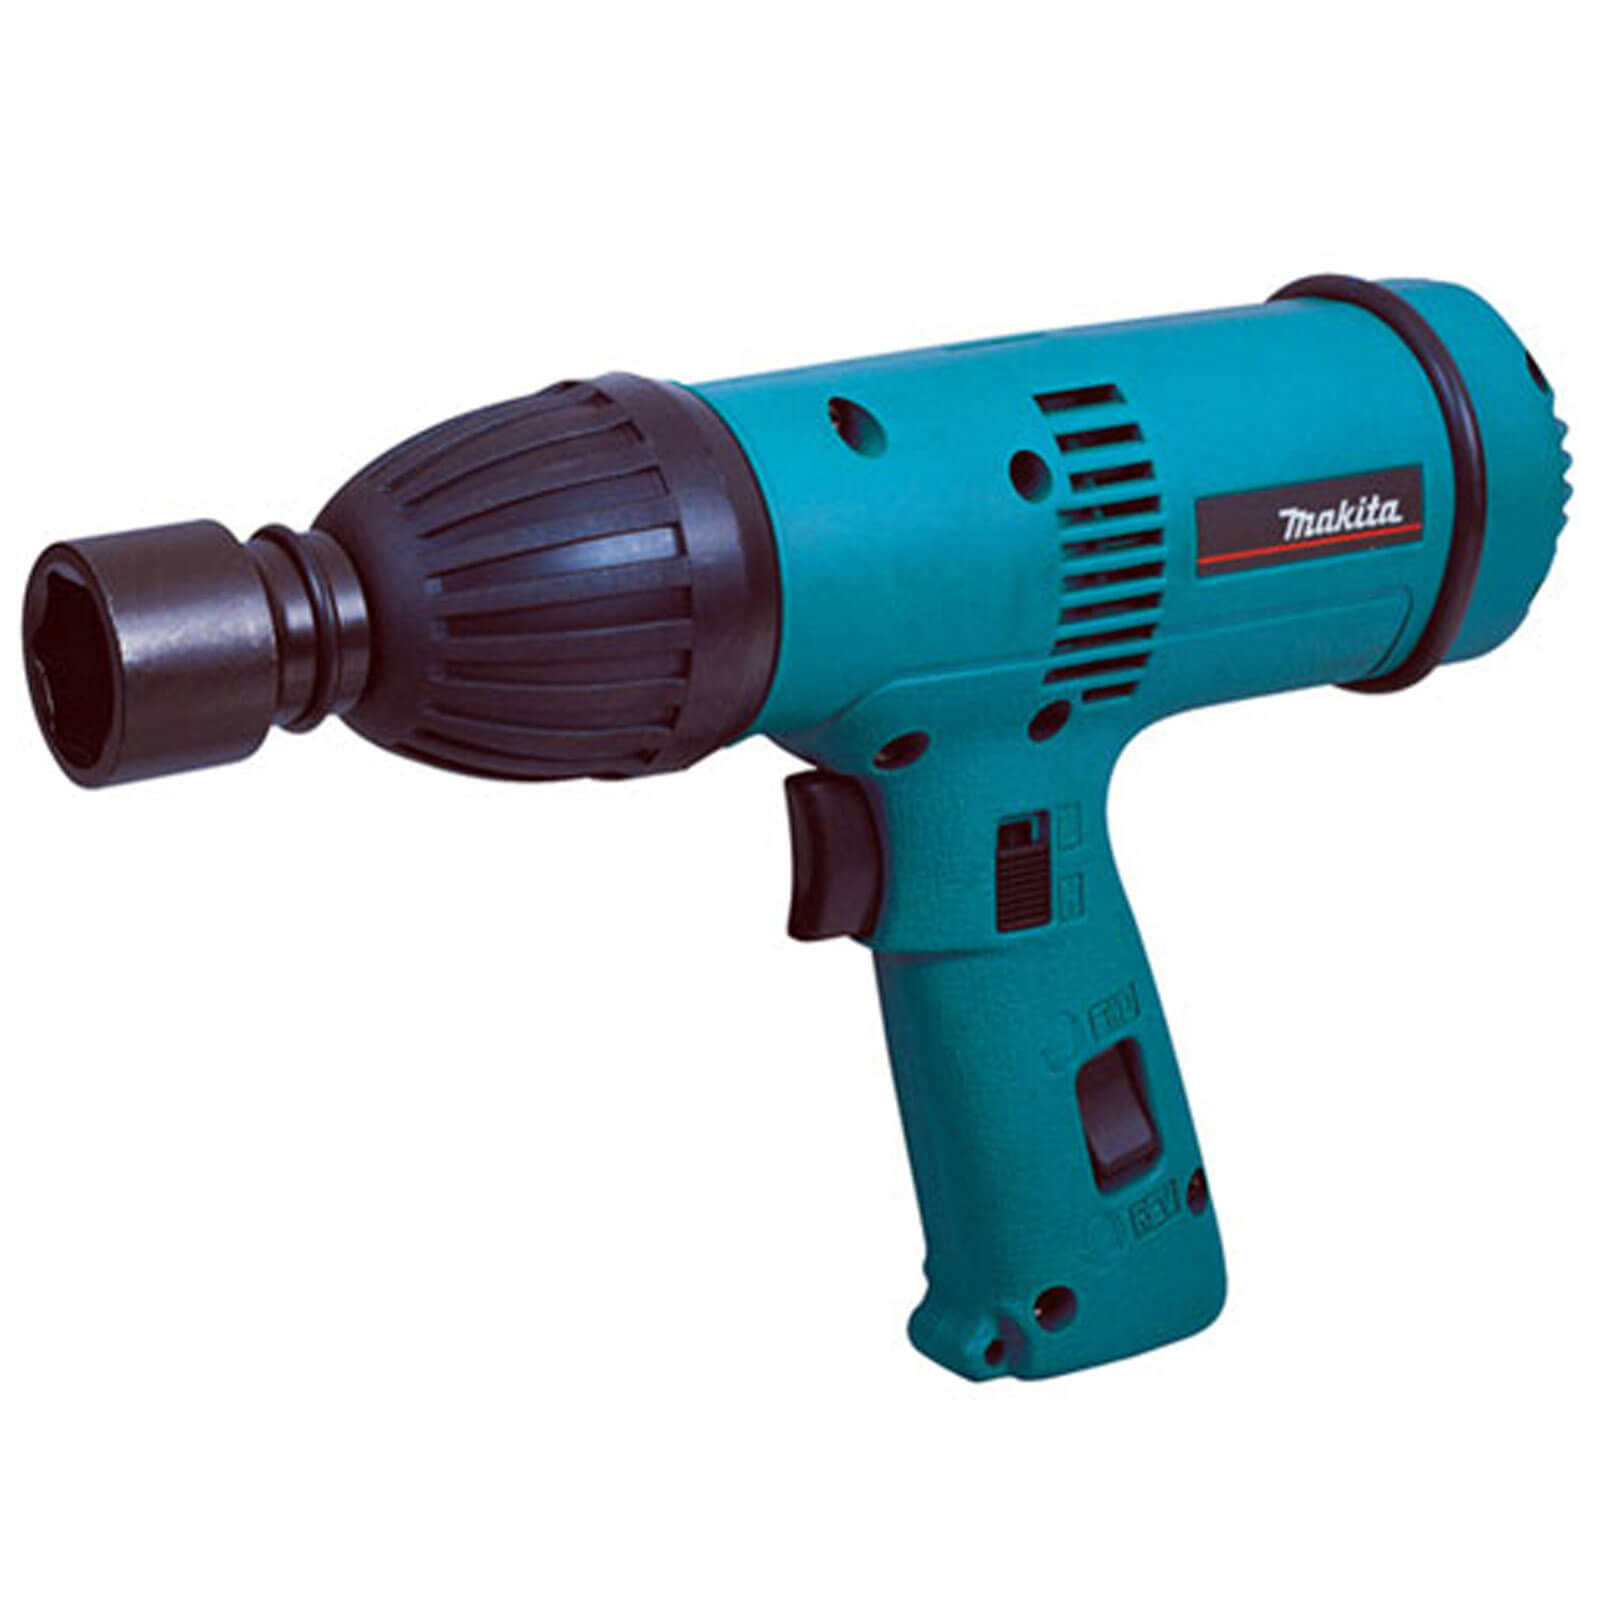 Makita 6904VH Impact Wrench 1/2